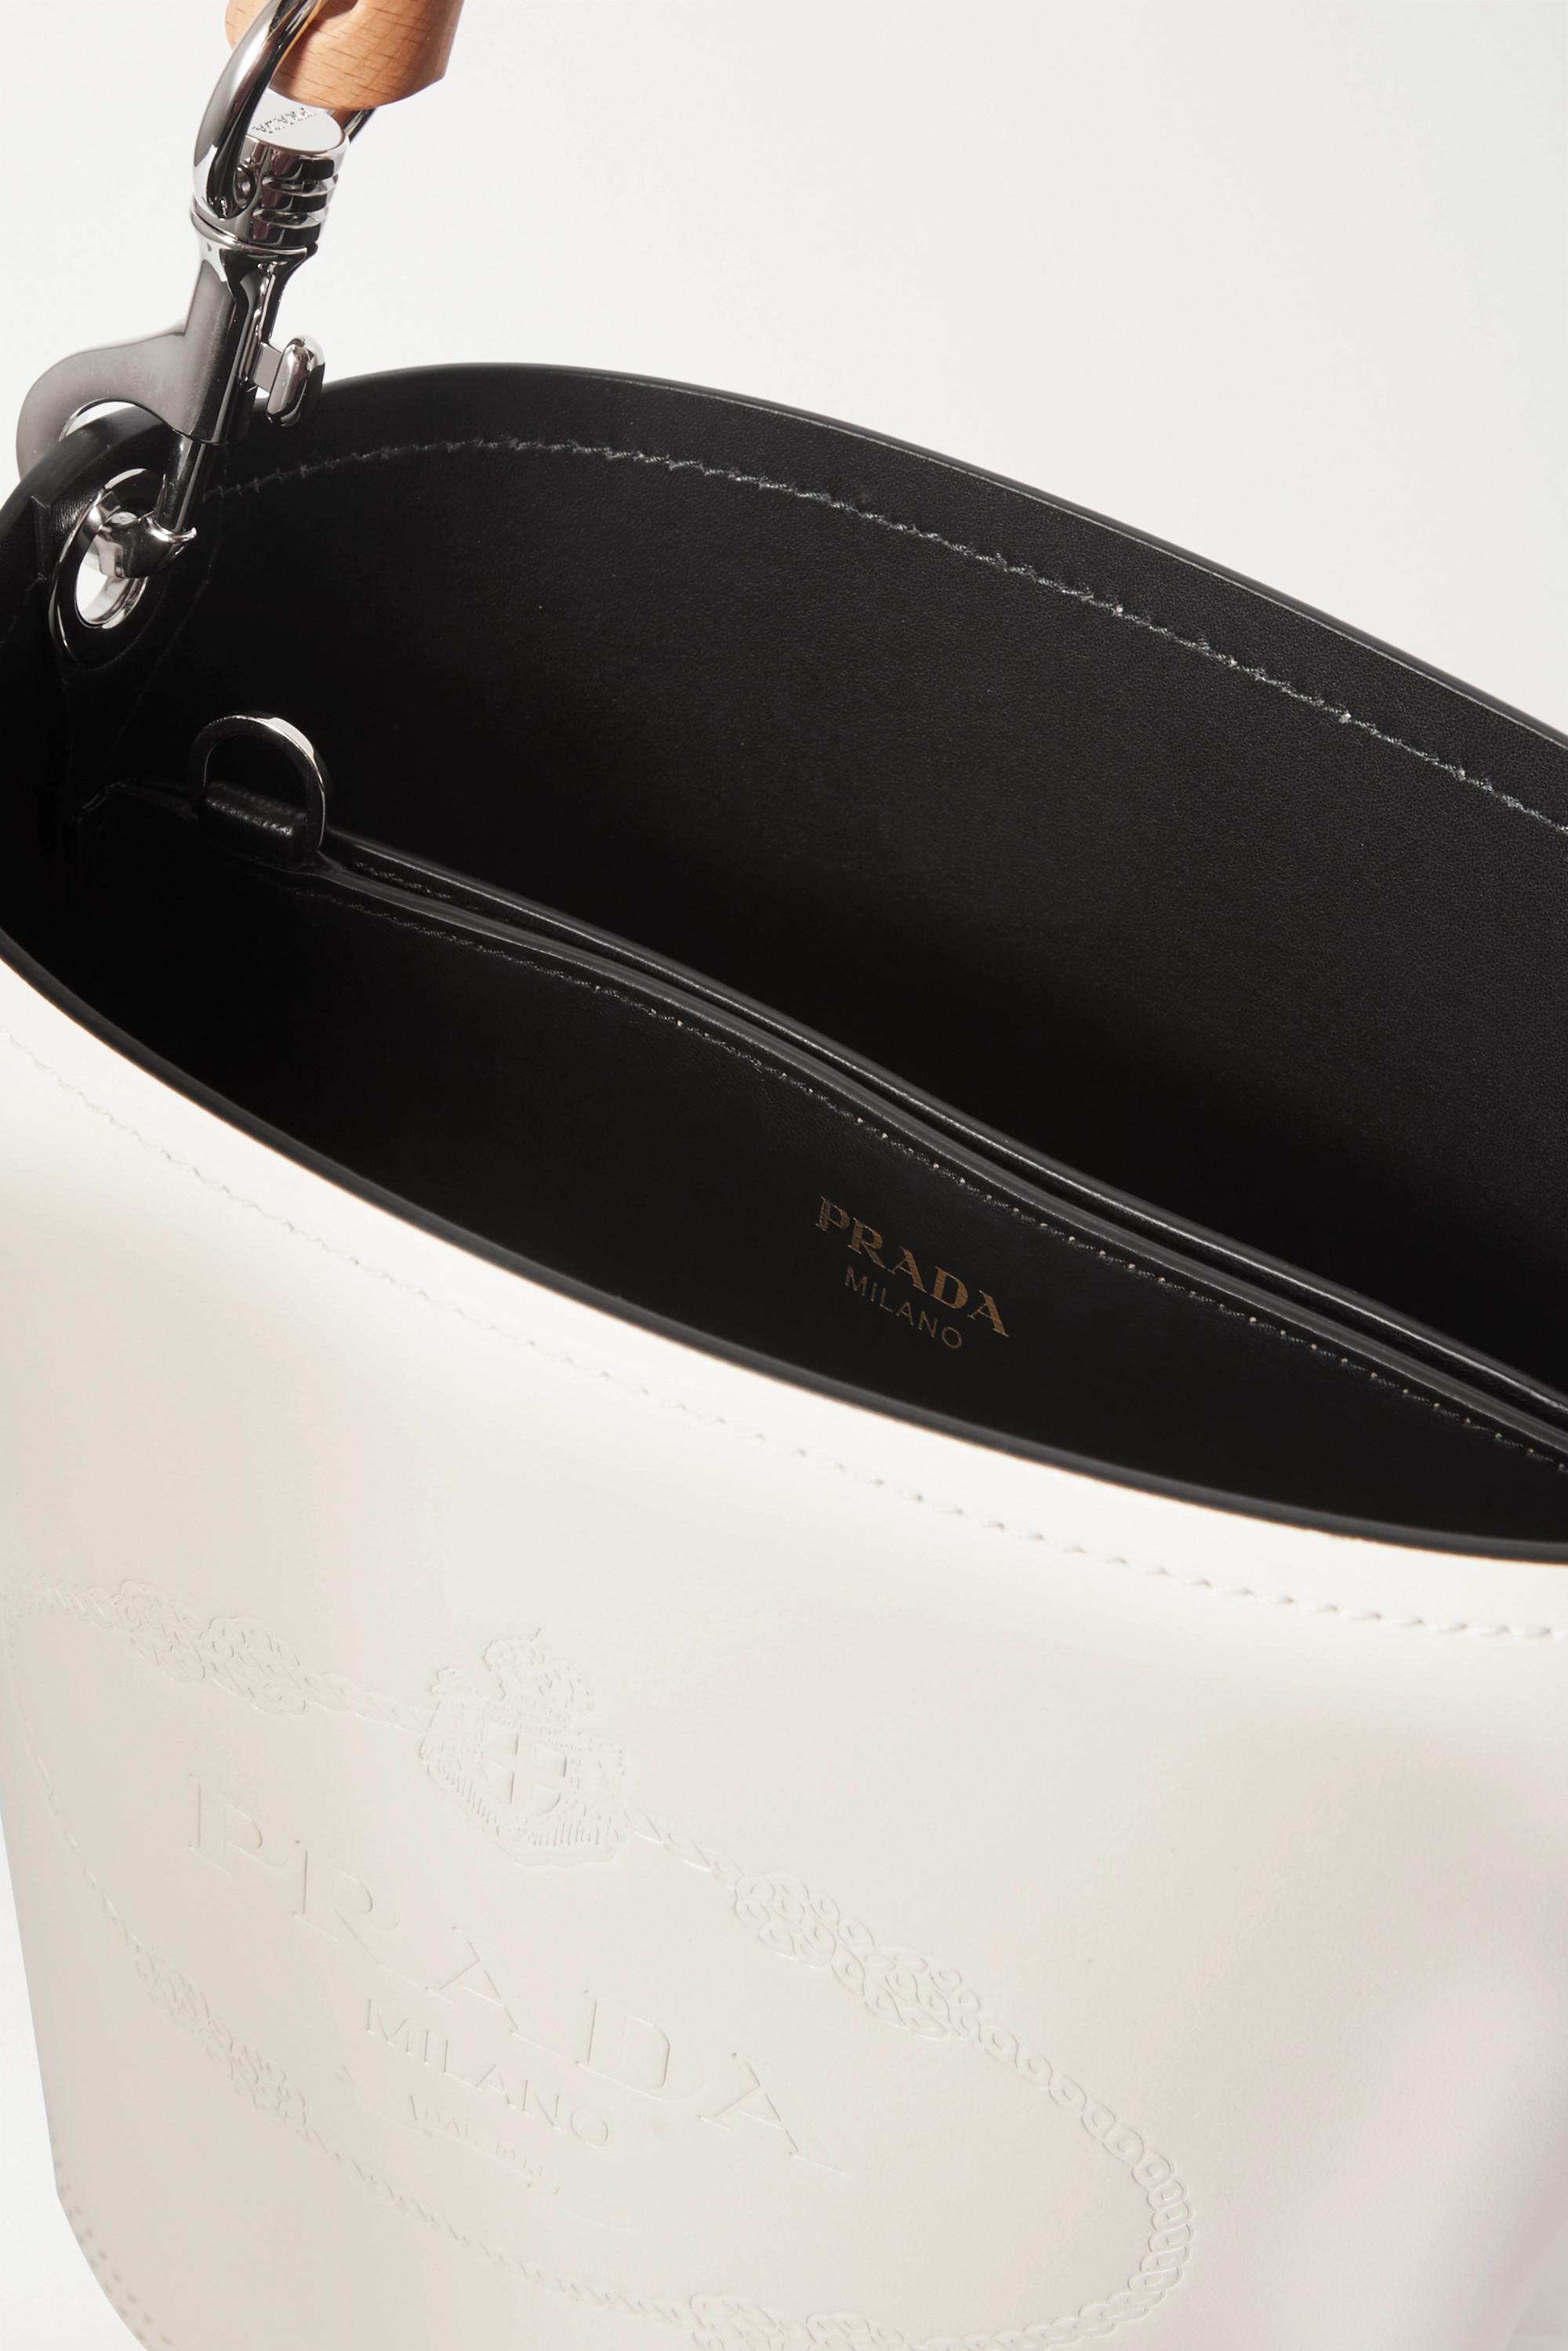 Prada Embossed leather bucket bag